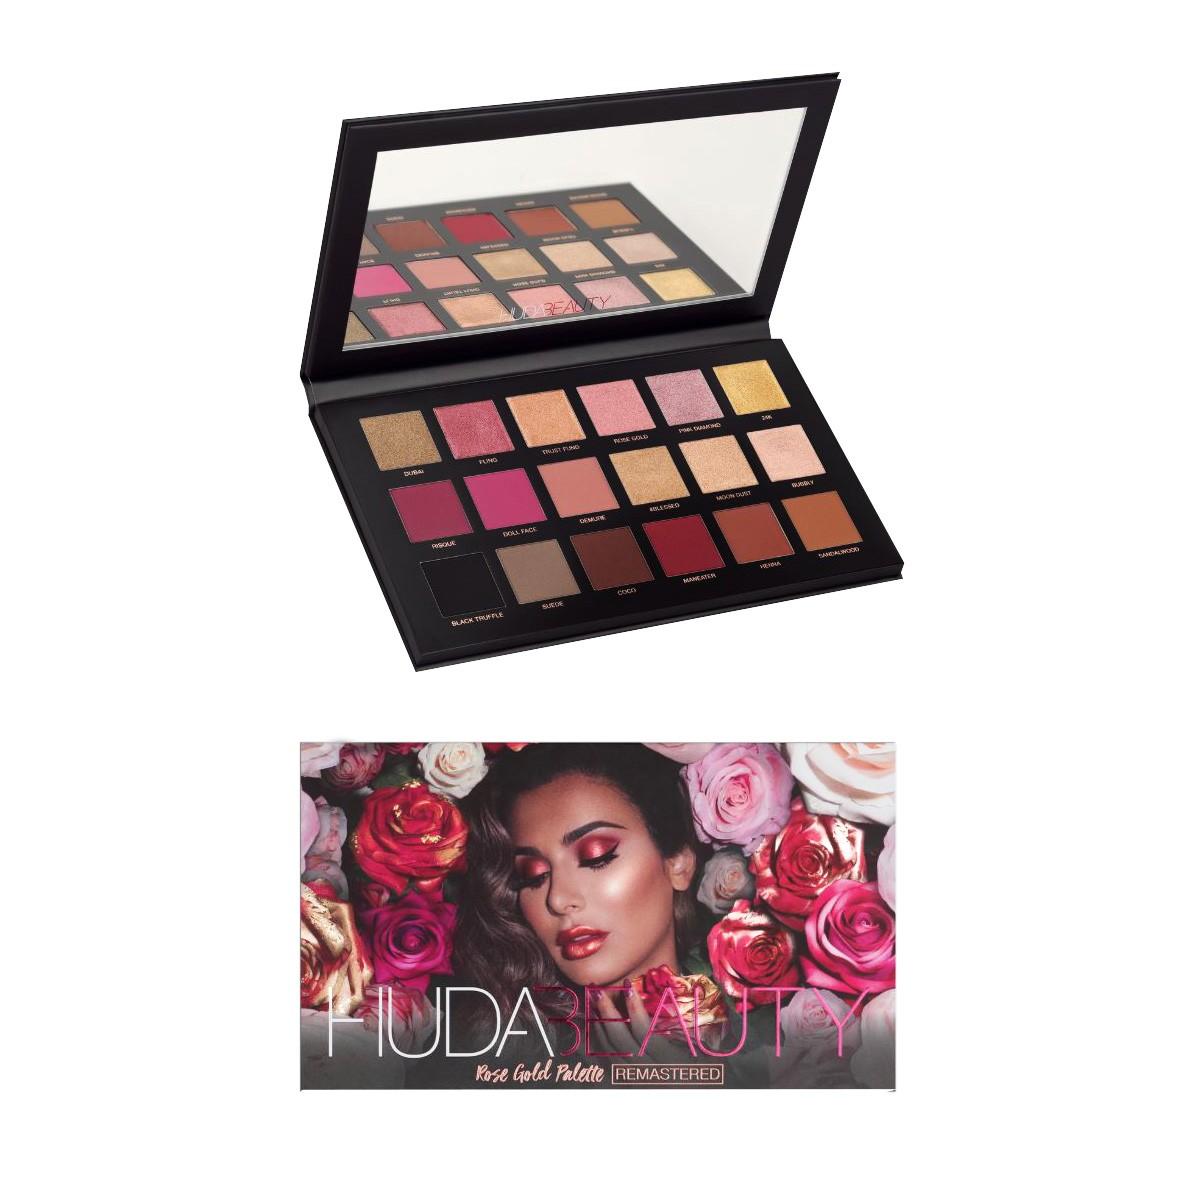 Kit Paletas De Sombra Para Maquiagem - Hud Beauty Luisance